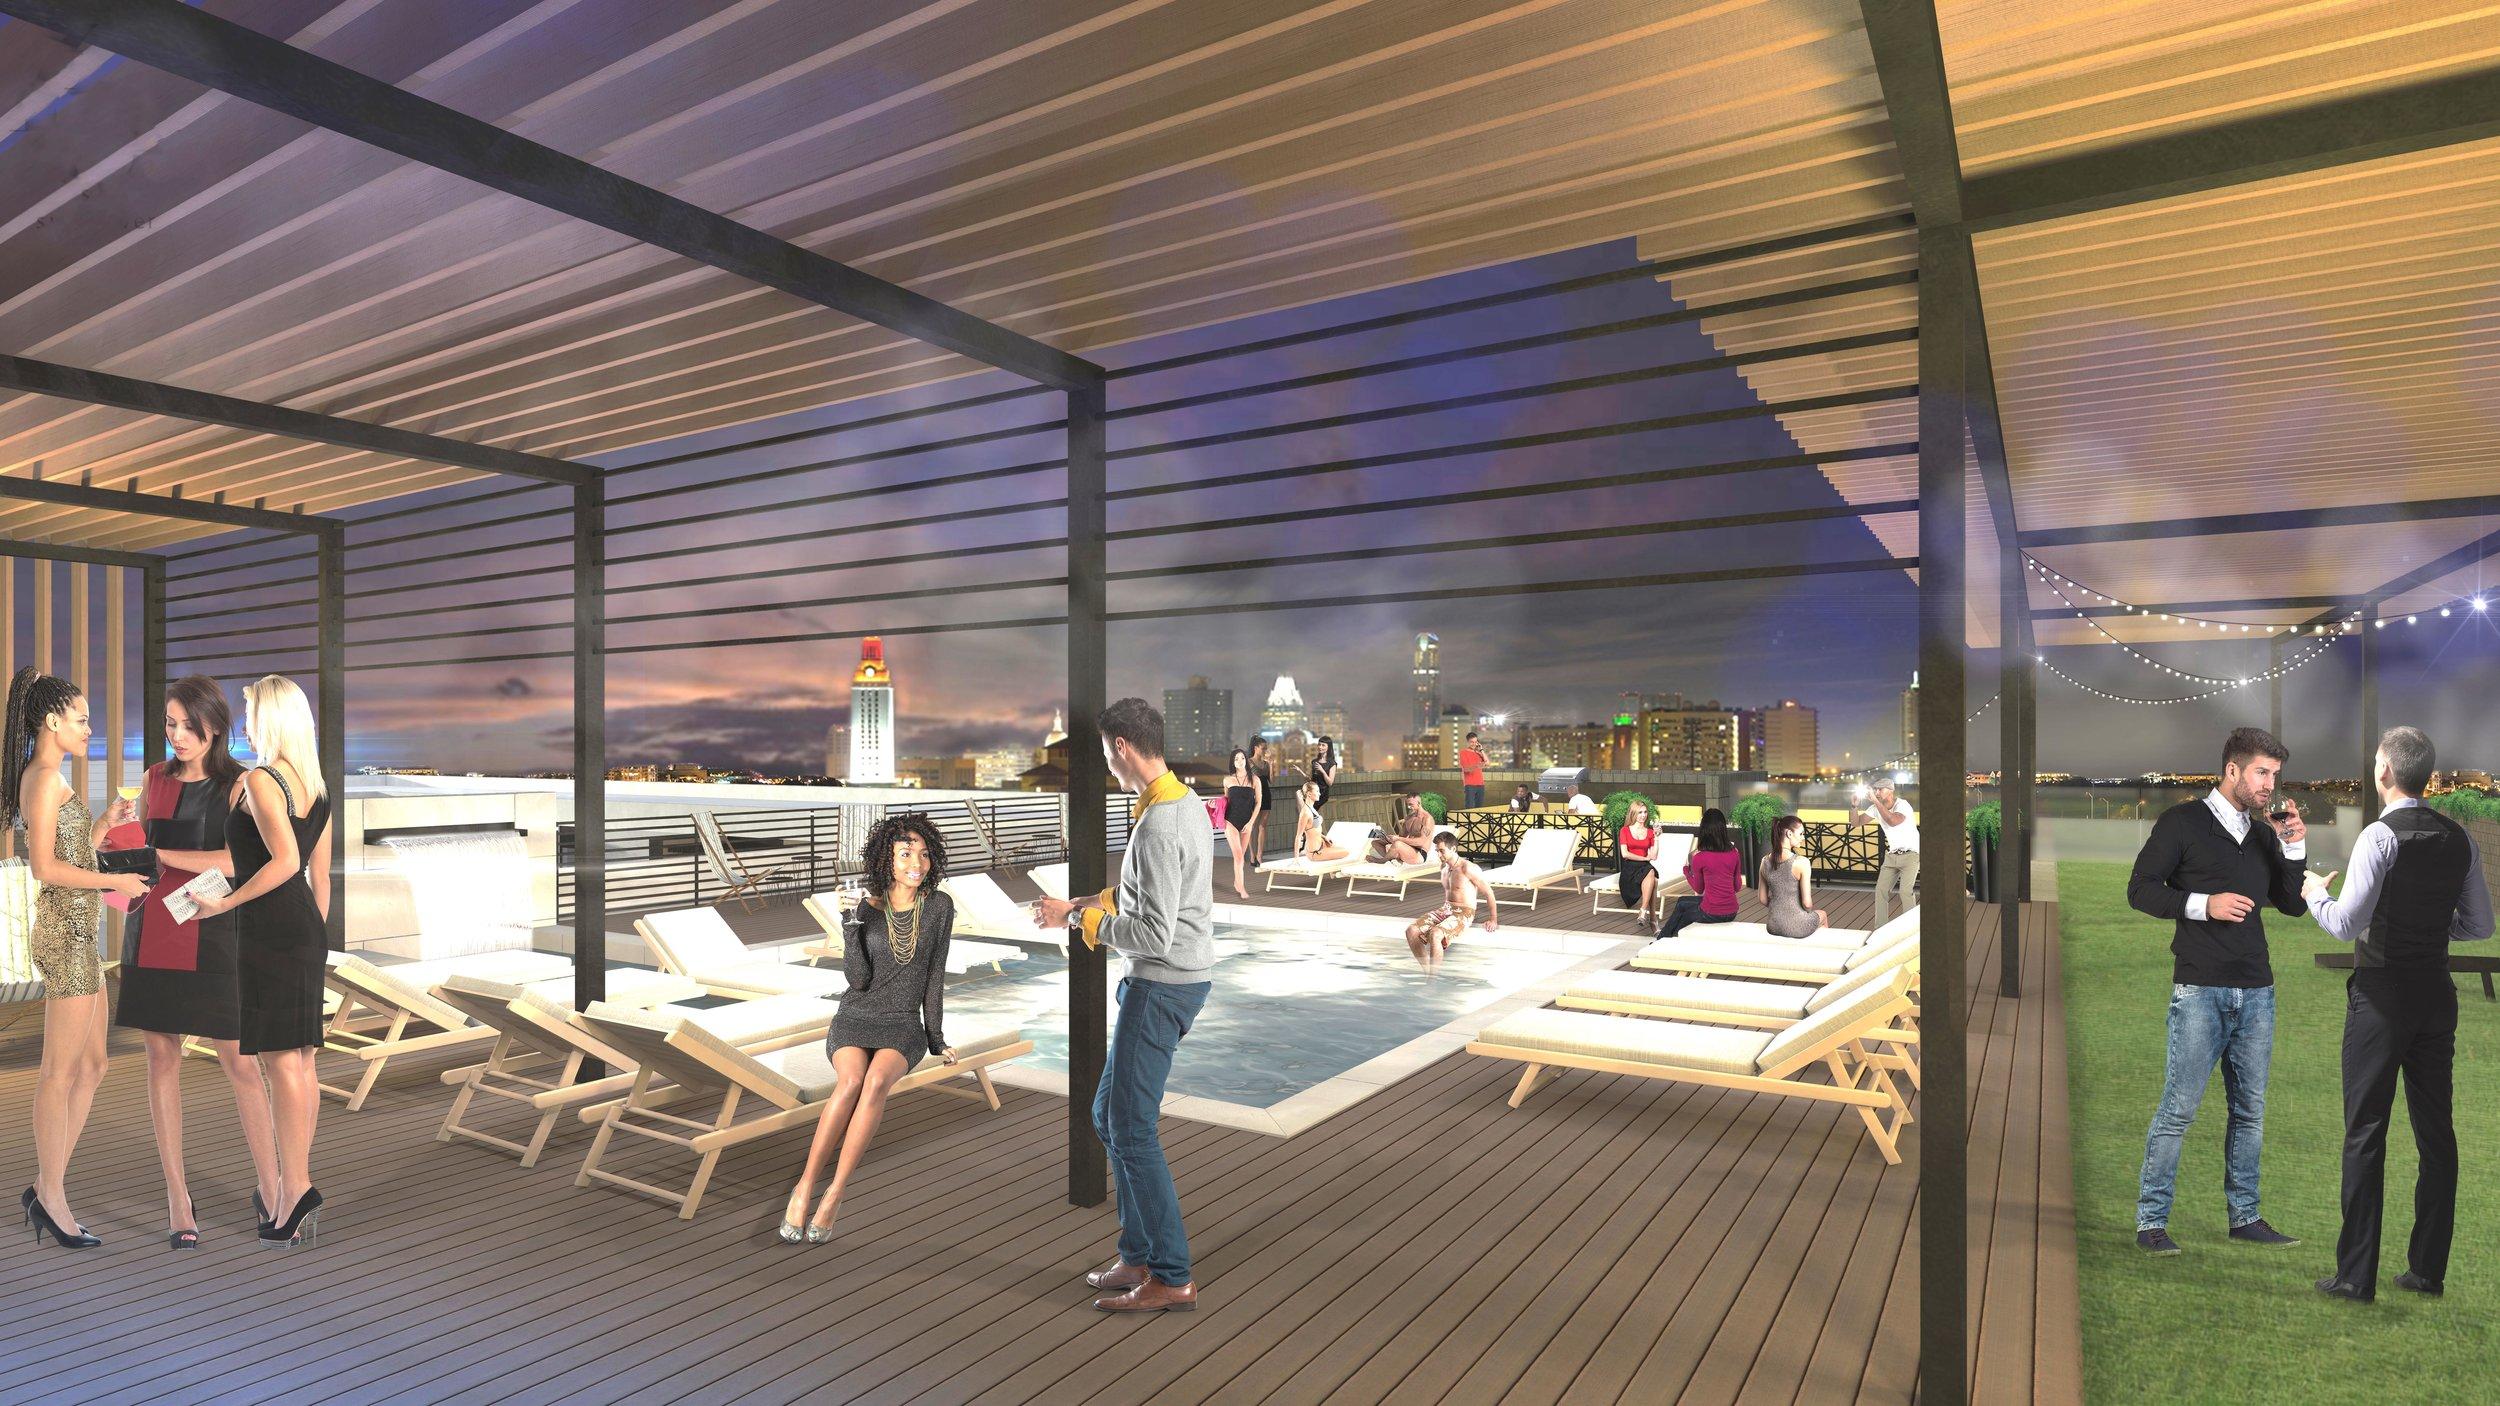 The Braxton Austin apartments amenities